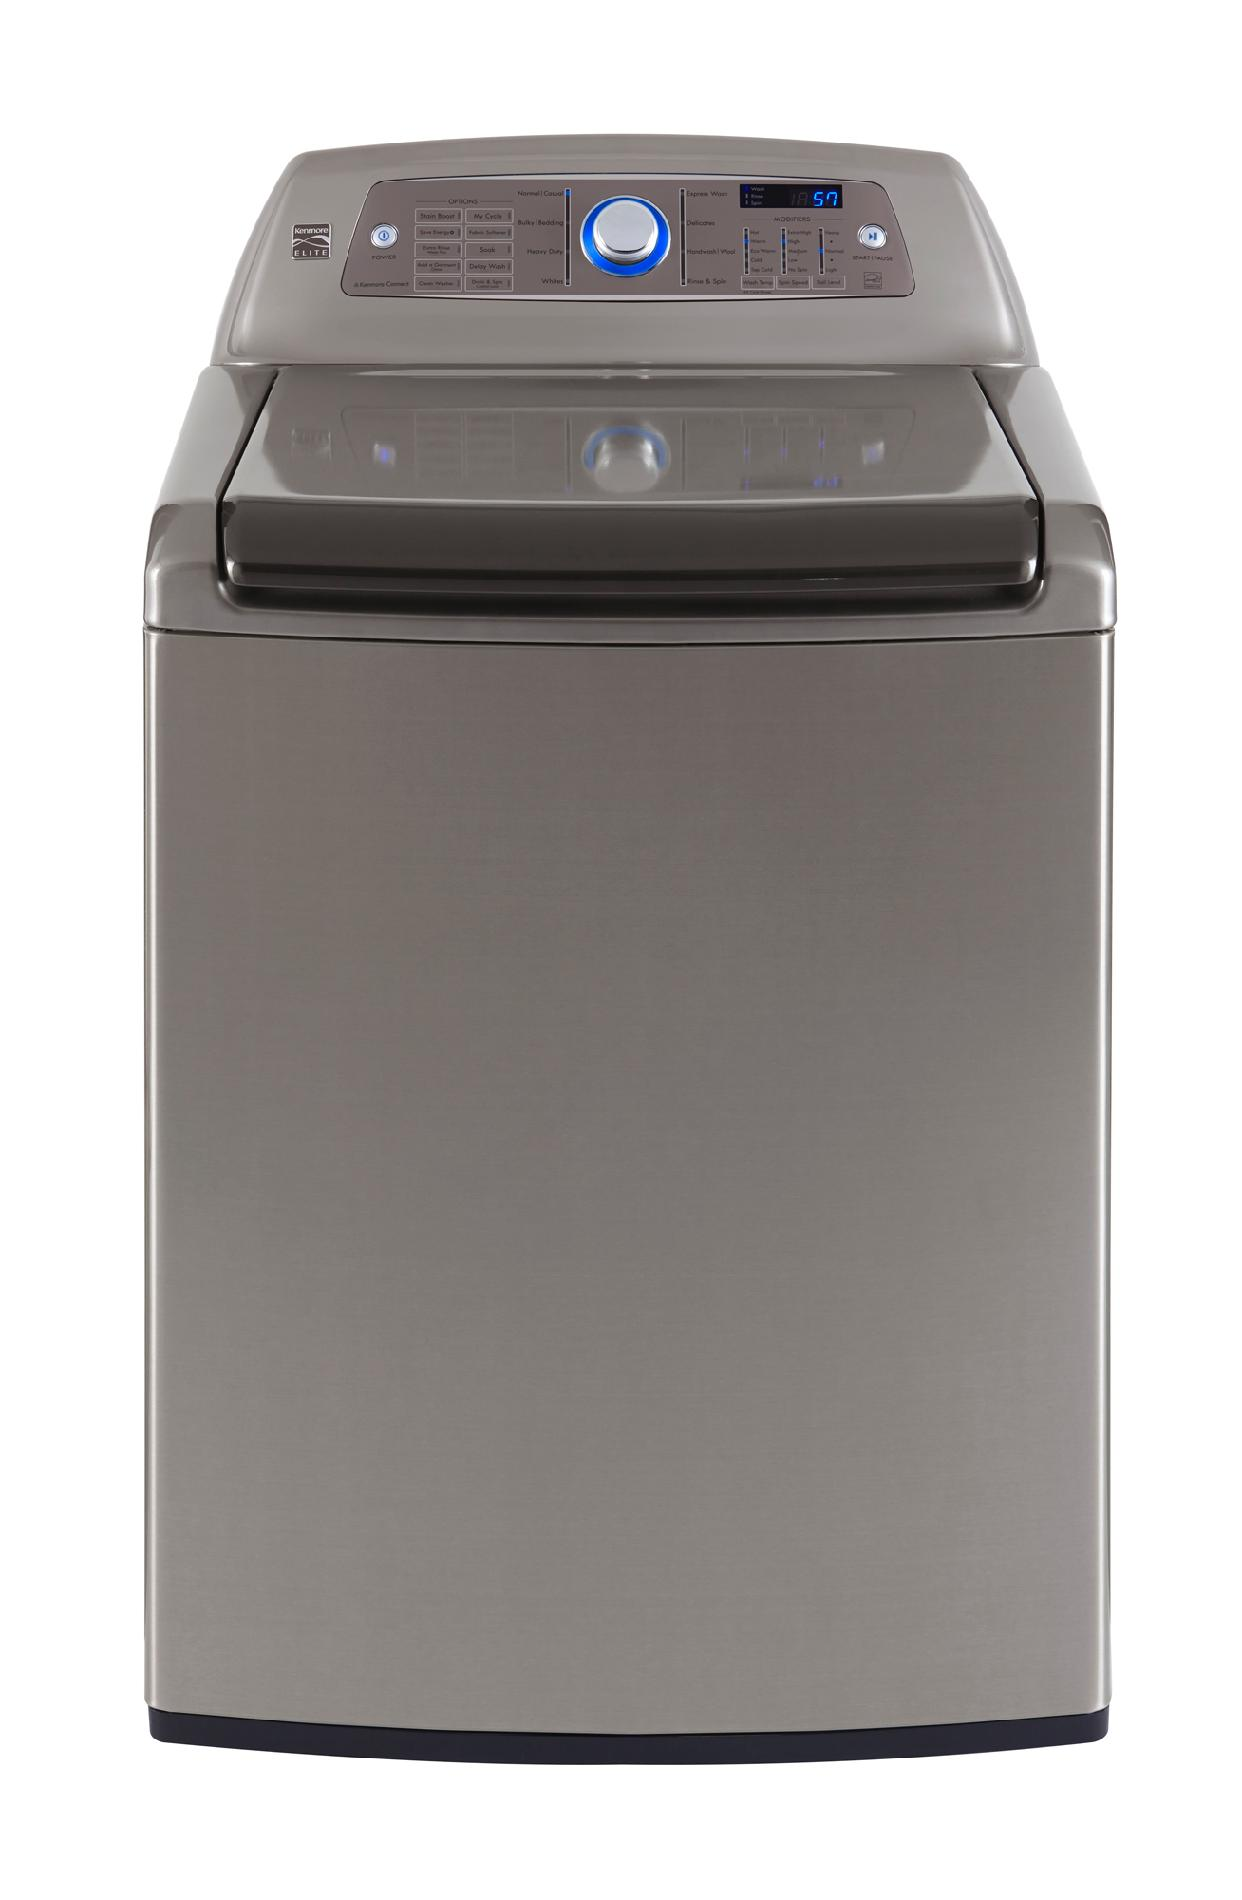 Kenmore Elite 4.7 Cu. Ft. High-efficiency Top-load Washer - Metallic Silver Energy Star